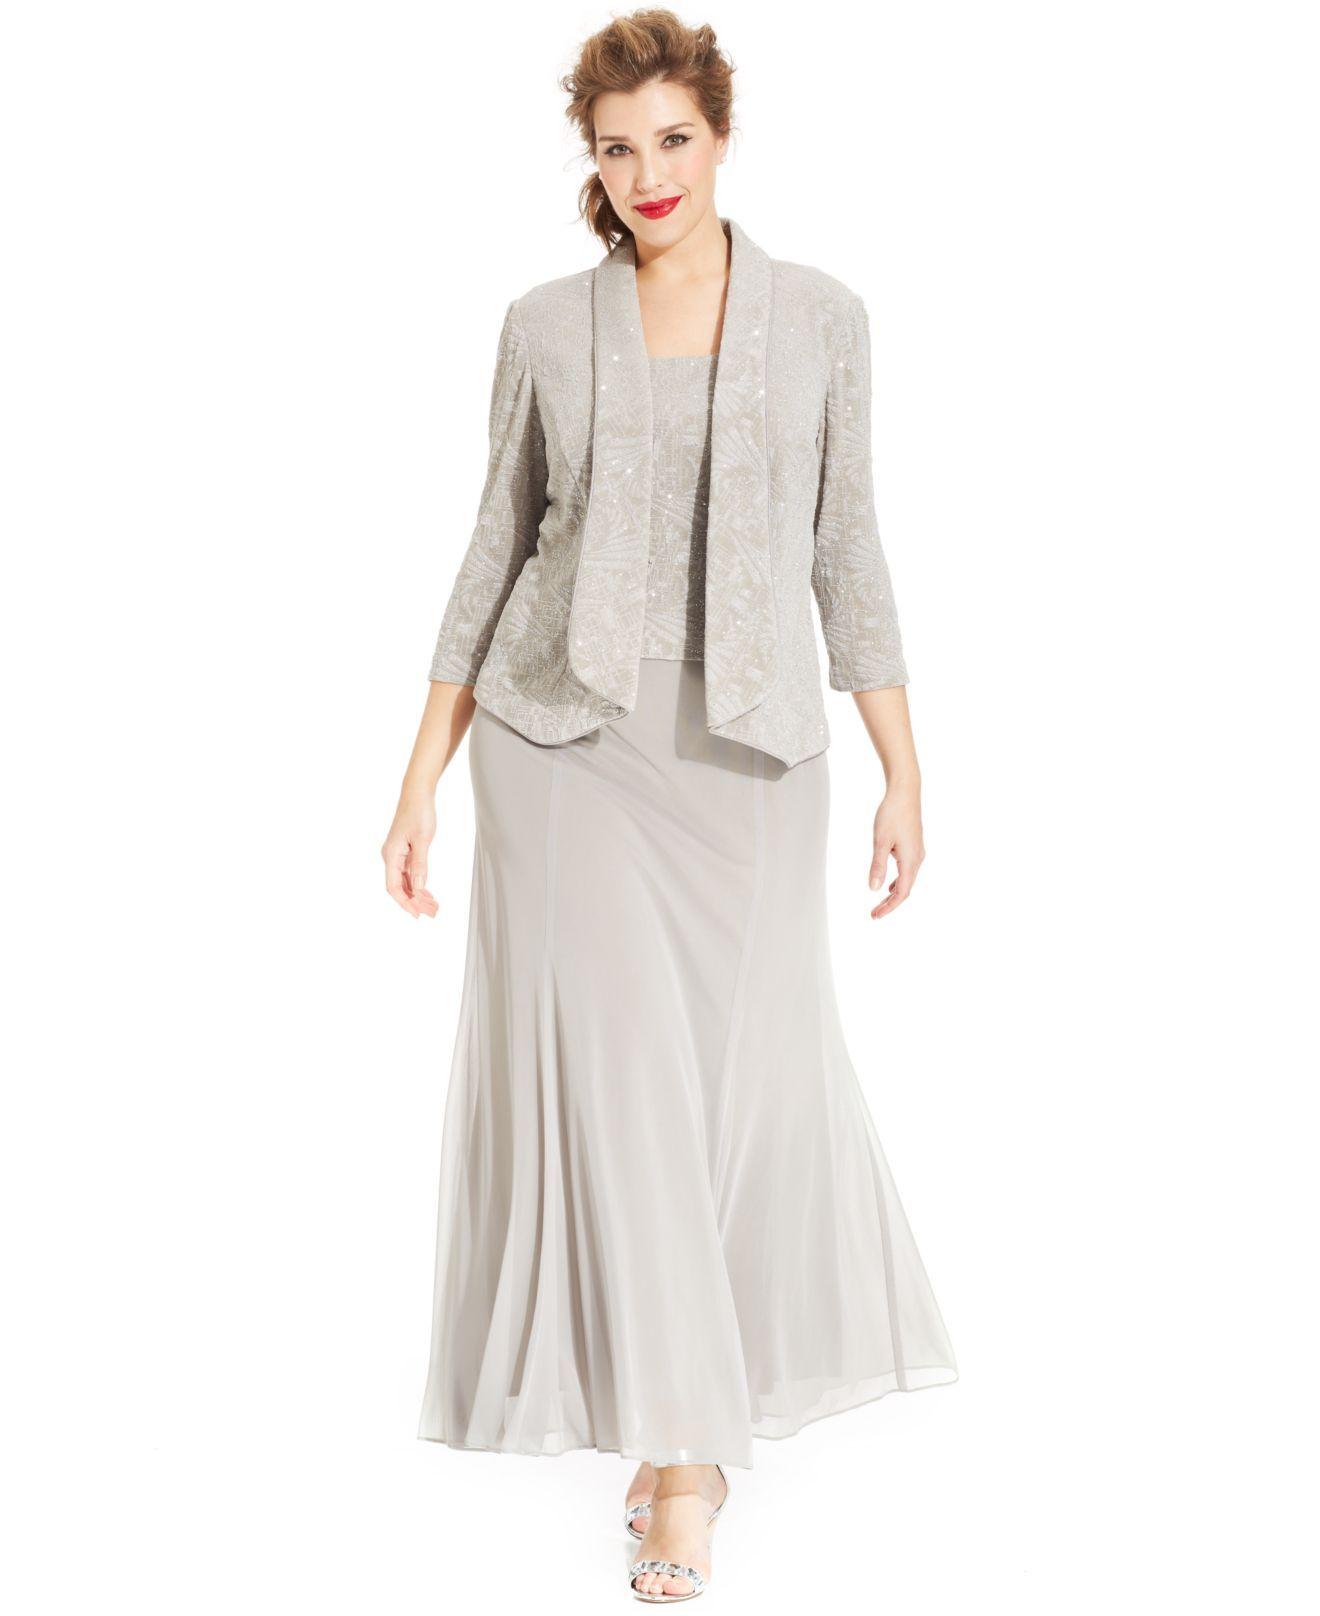 alex evenings bolero jacket dress plus size | best dress ideas